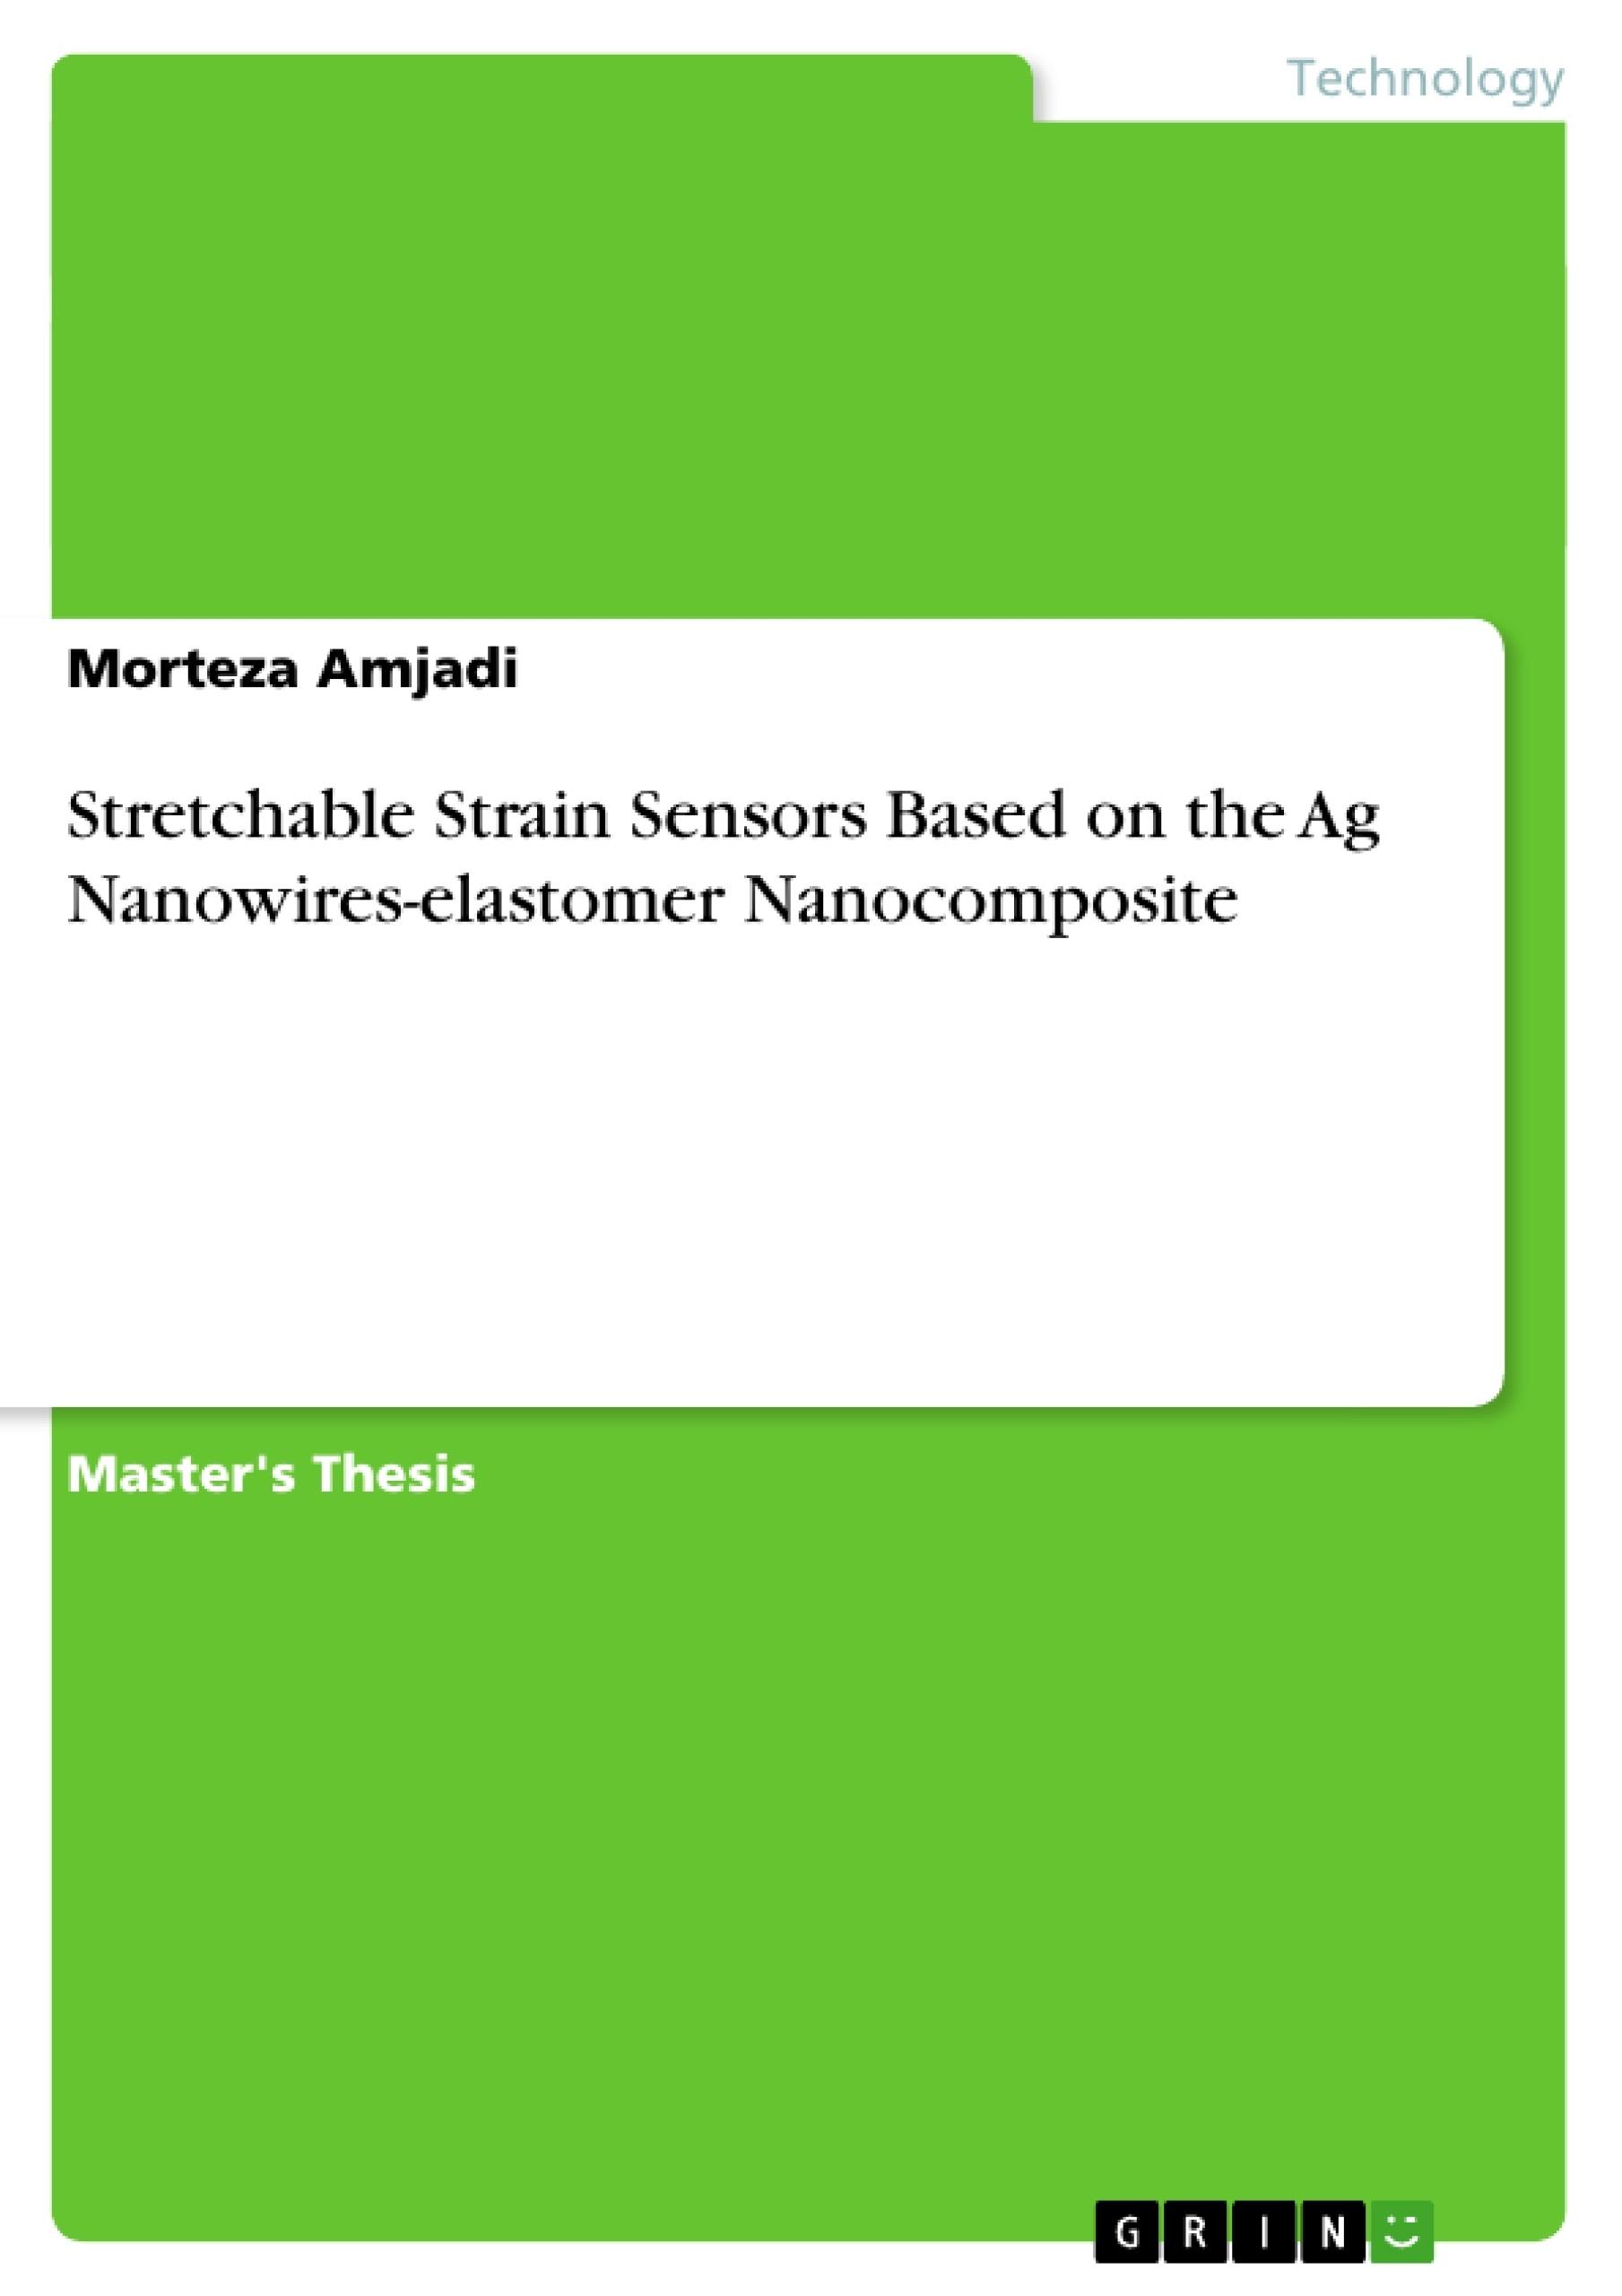 Title: Stretchable Strain Sensors Based on the Ag Nanowires-elastomer Nanocomposite